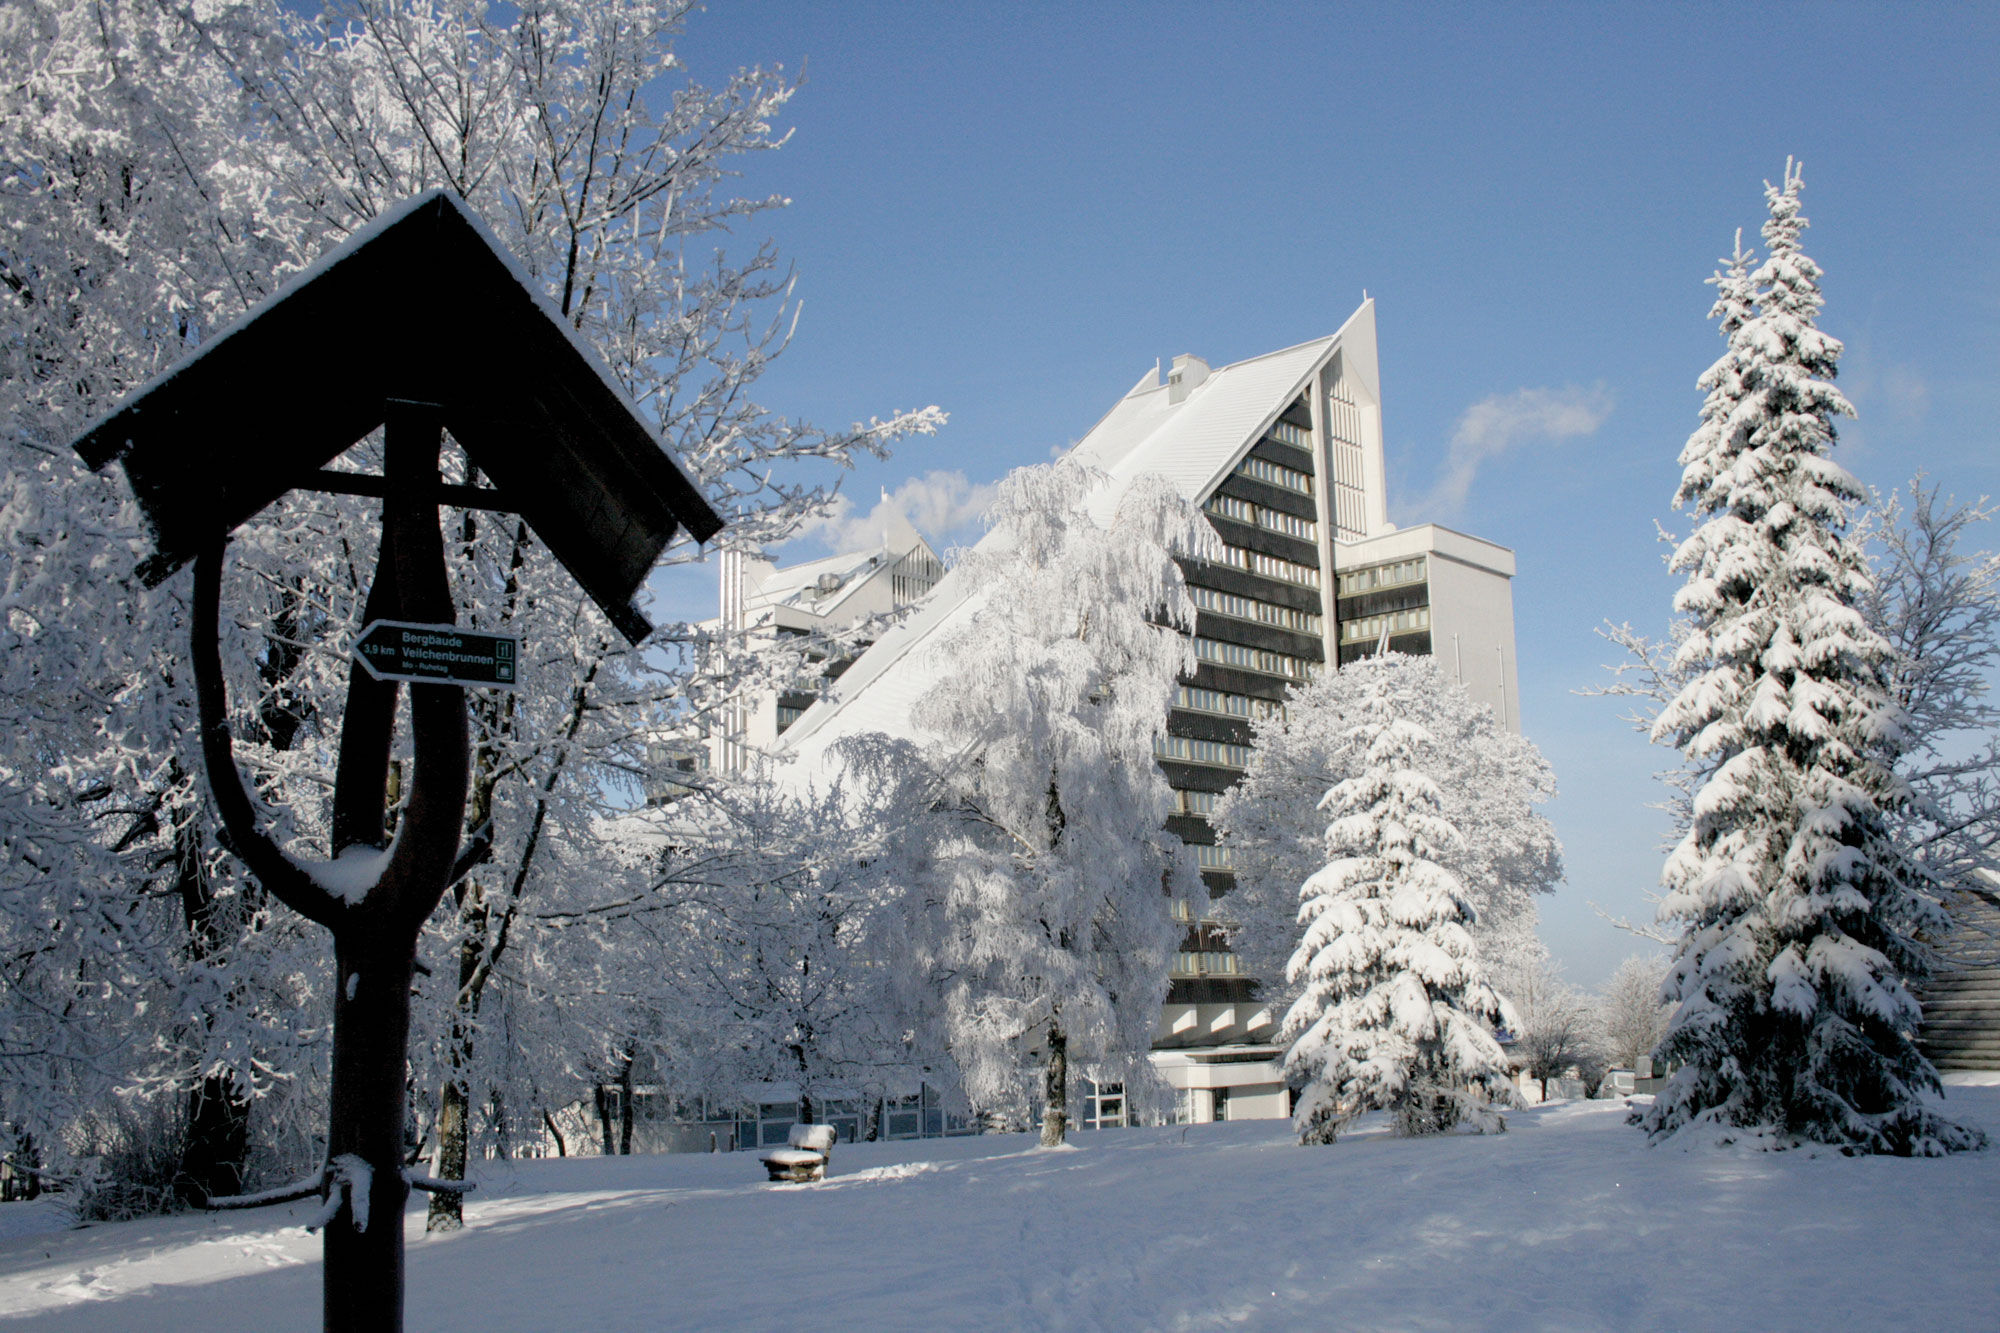 AHORN Panorama Hotel Oberhof im Winter